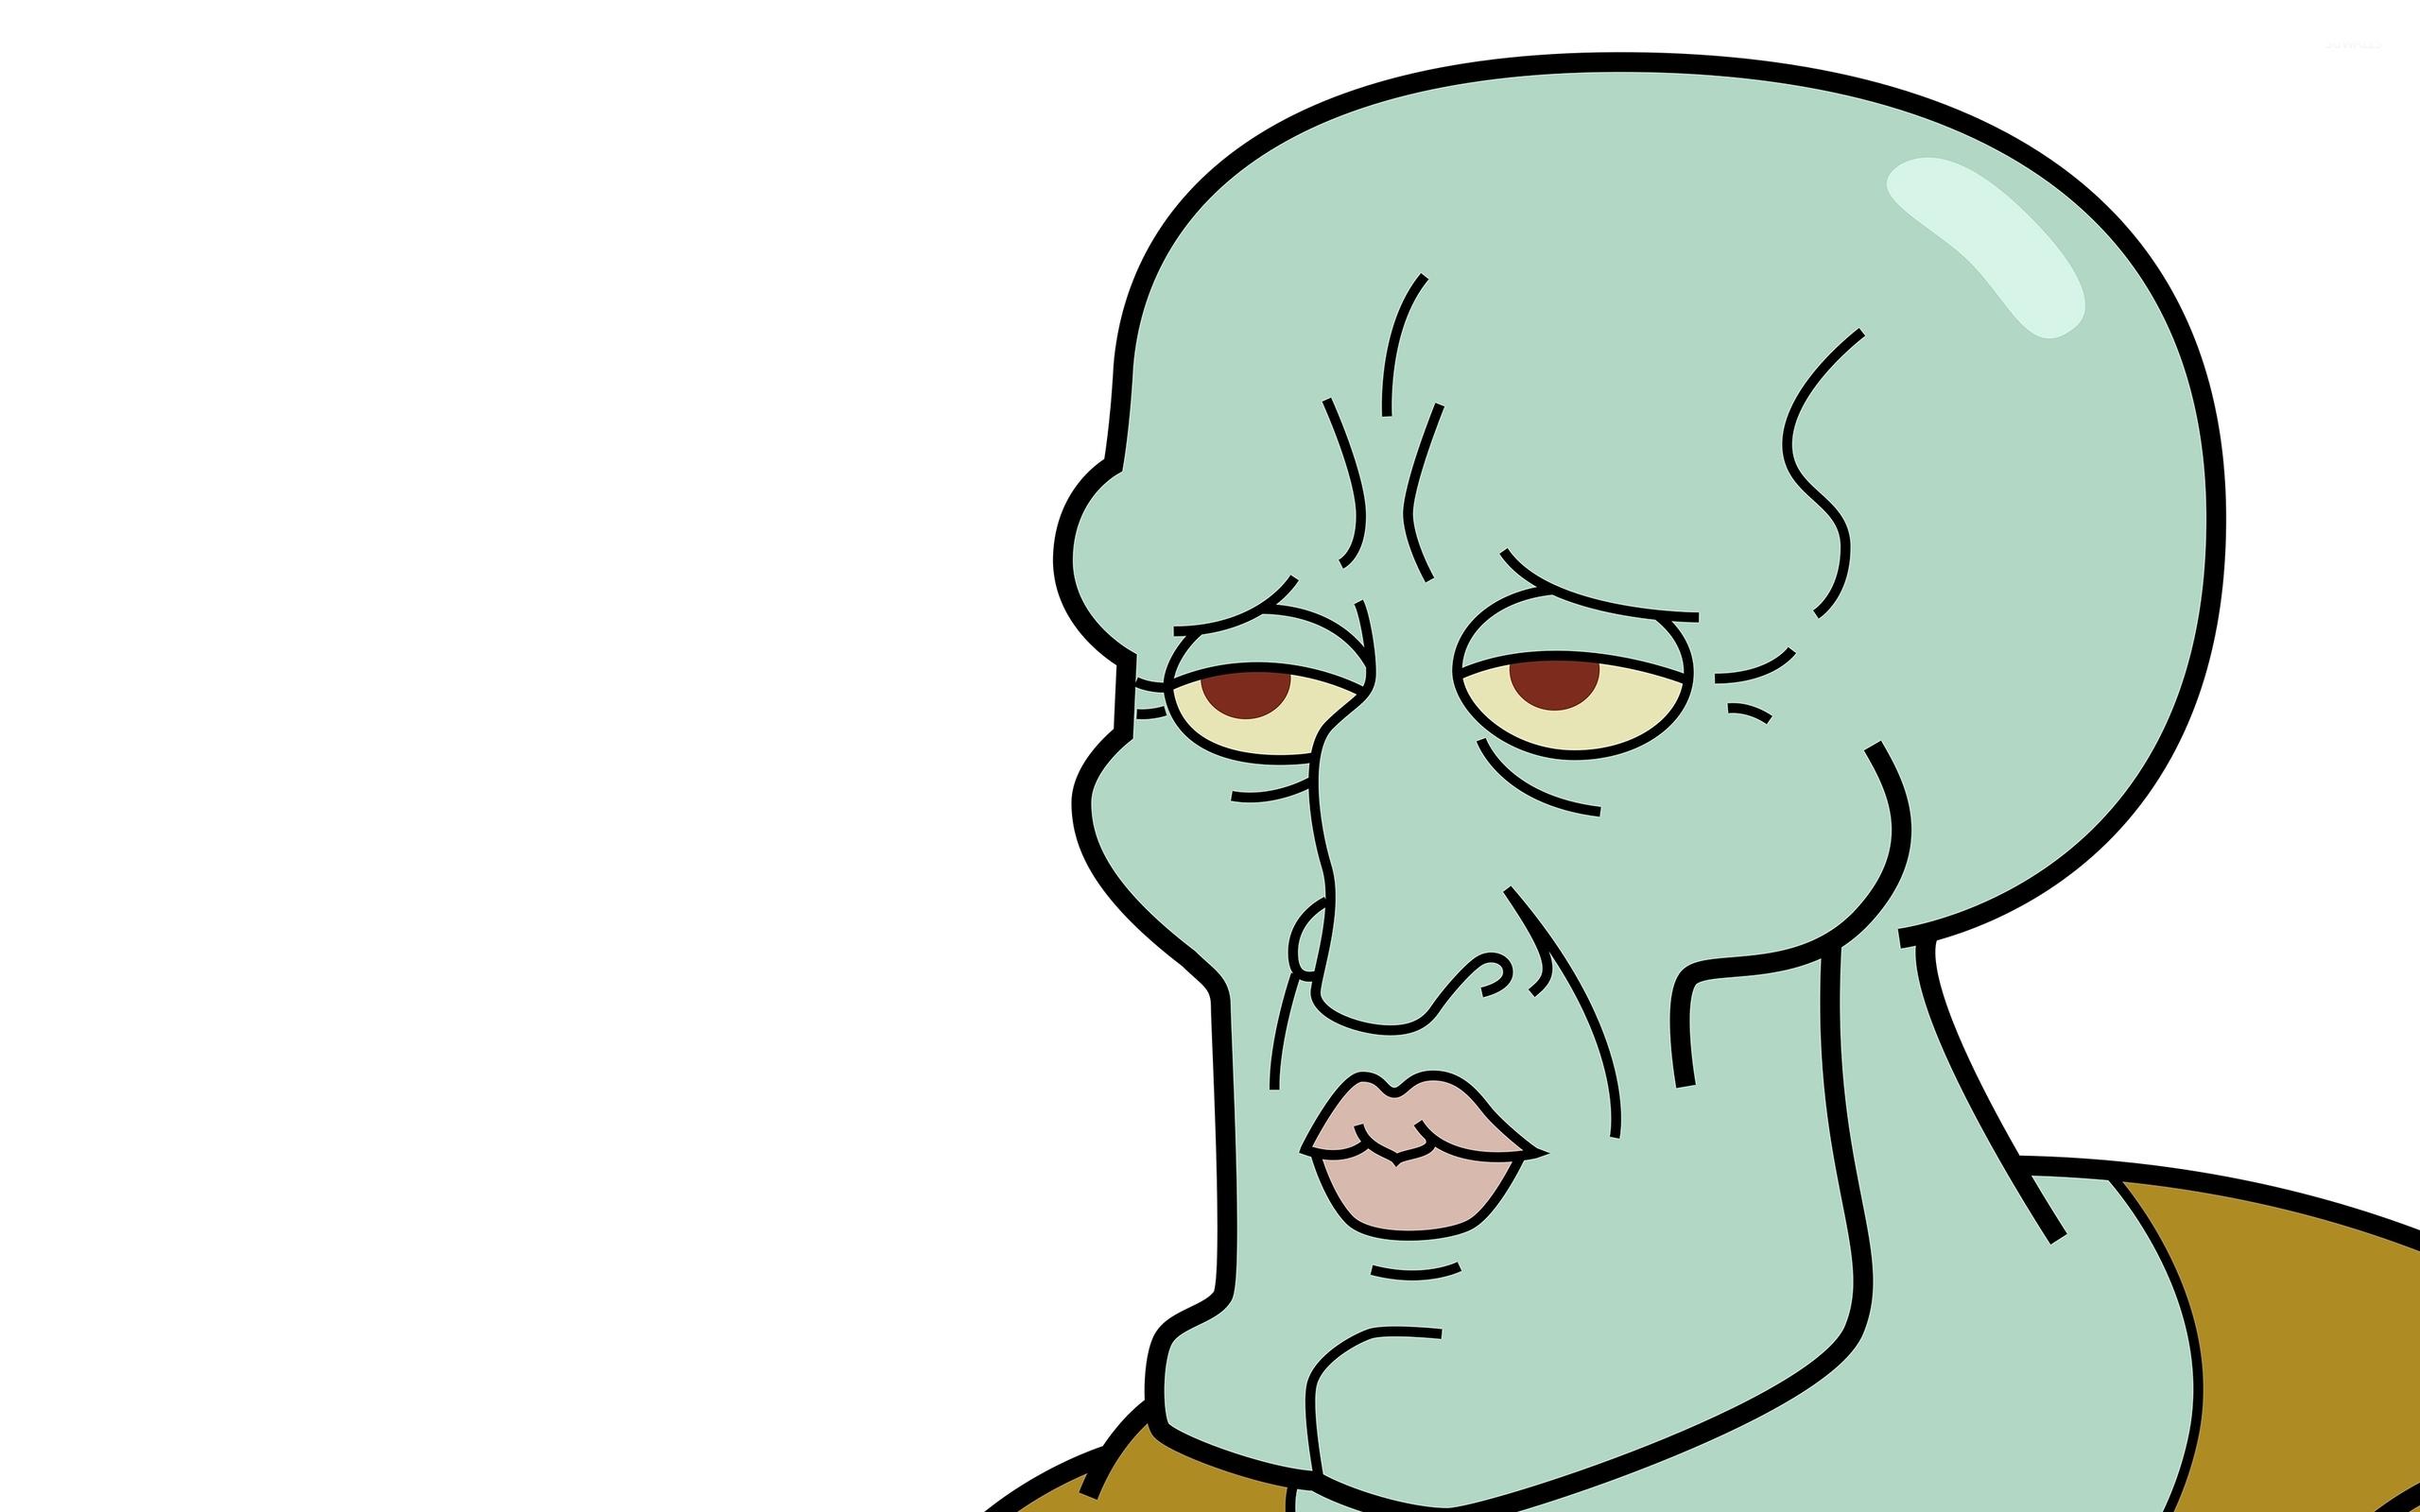 Handsome Squidward wallpaper   Meme wallpapers   42402 2560x1600